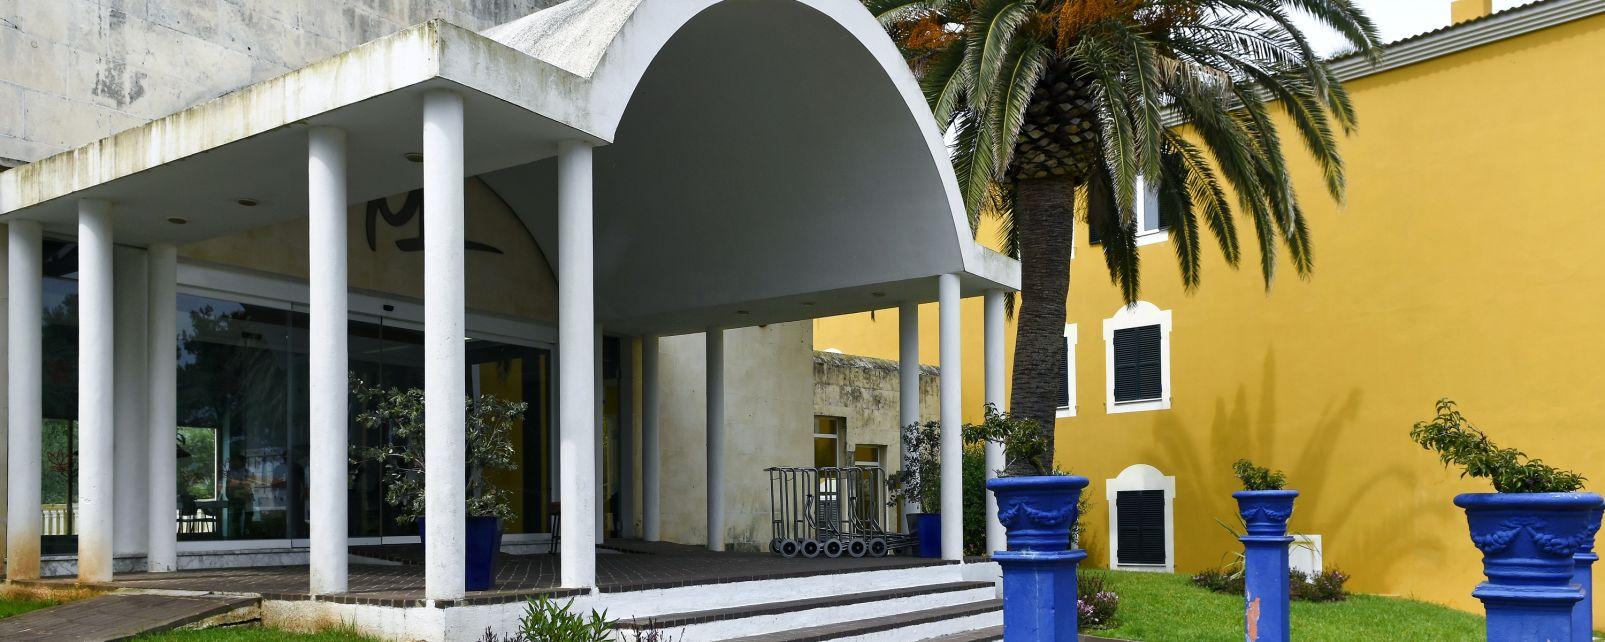 H tel club look a menorca resort - Hotel libourne pas cher ...